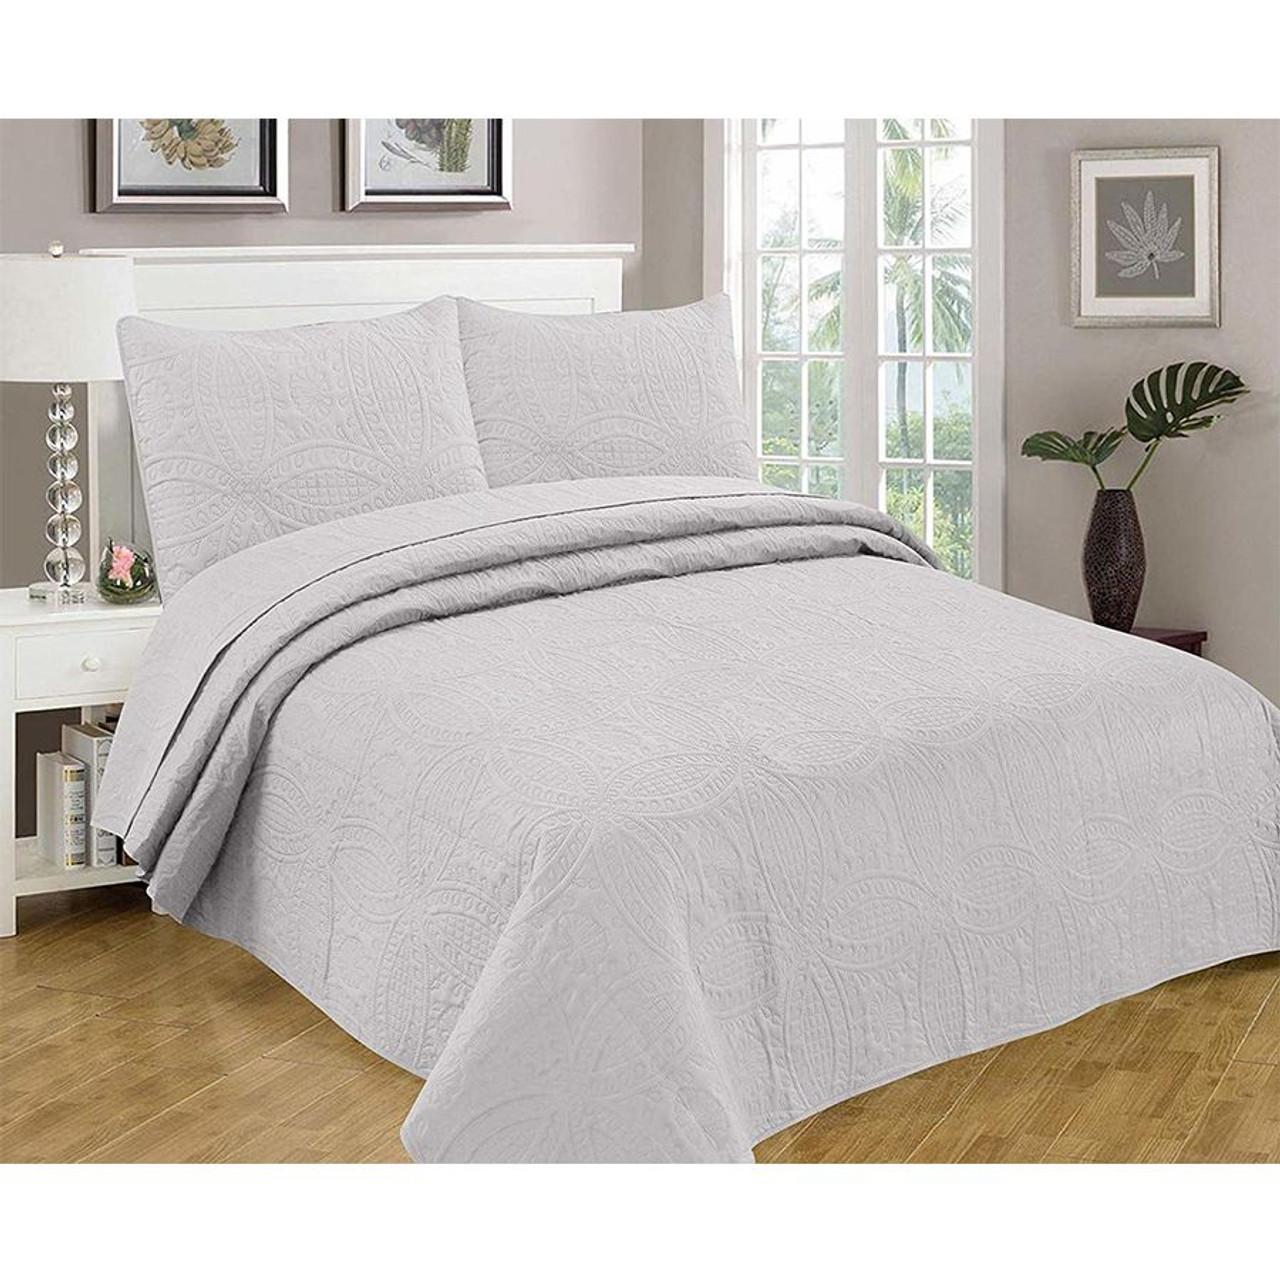 3 Pc Oversized Bedspread Coverlet Set Grey Color Legacy Decor